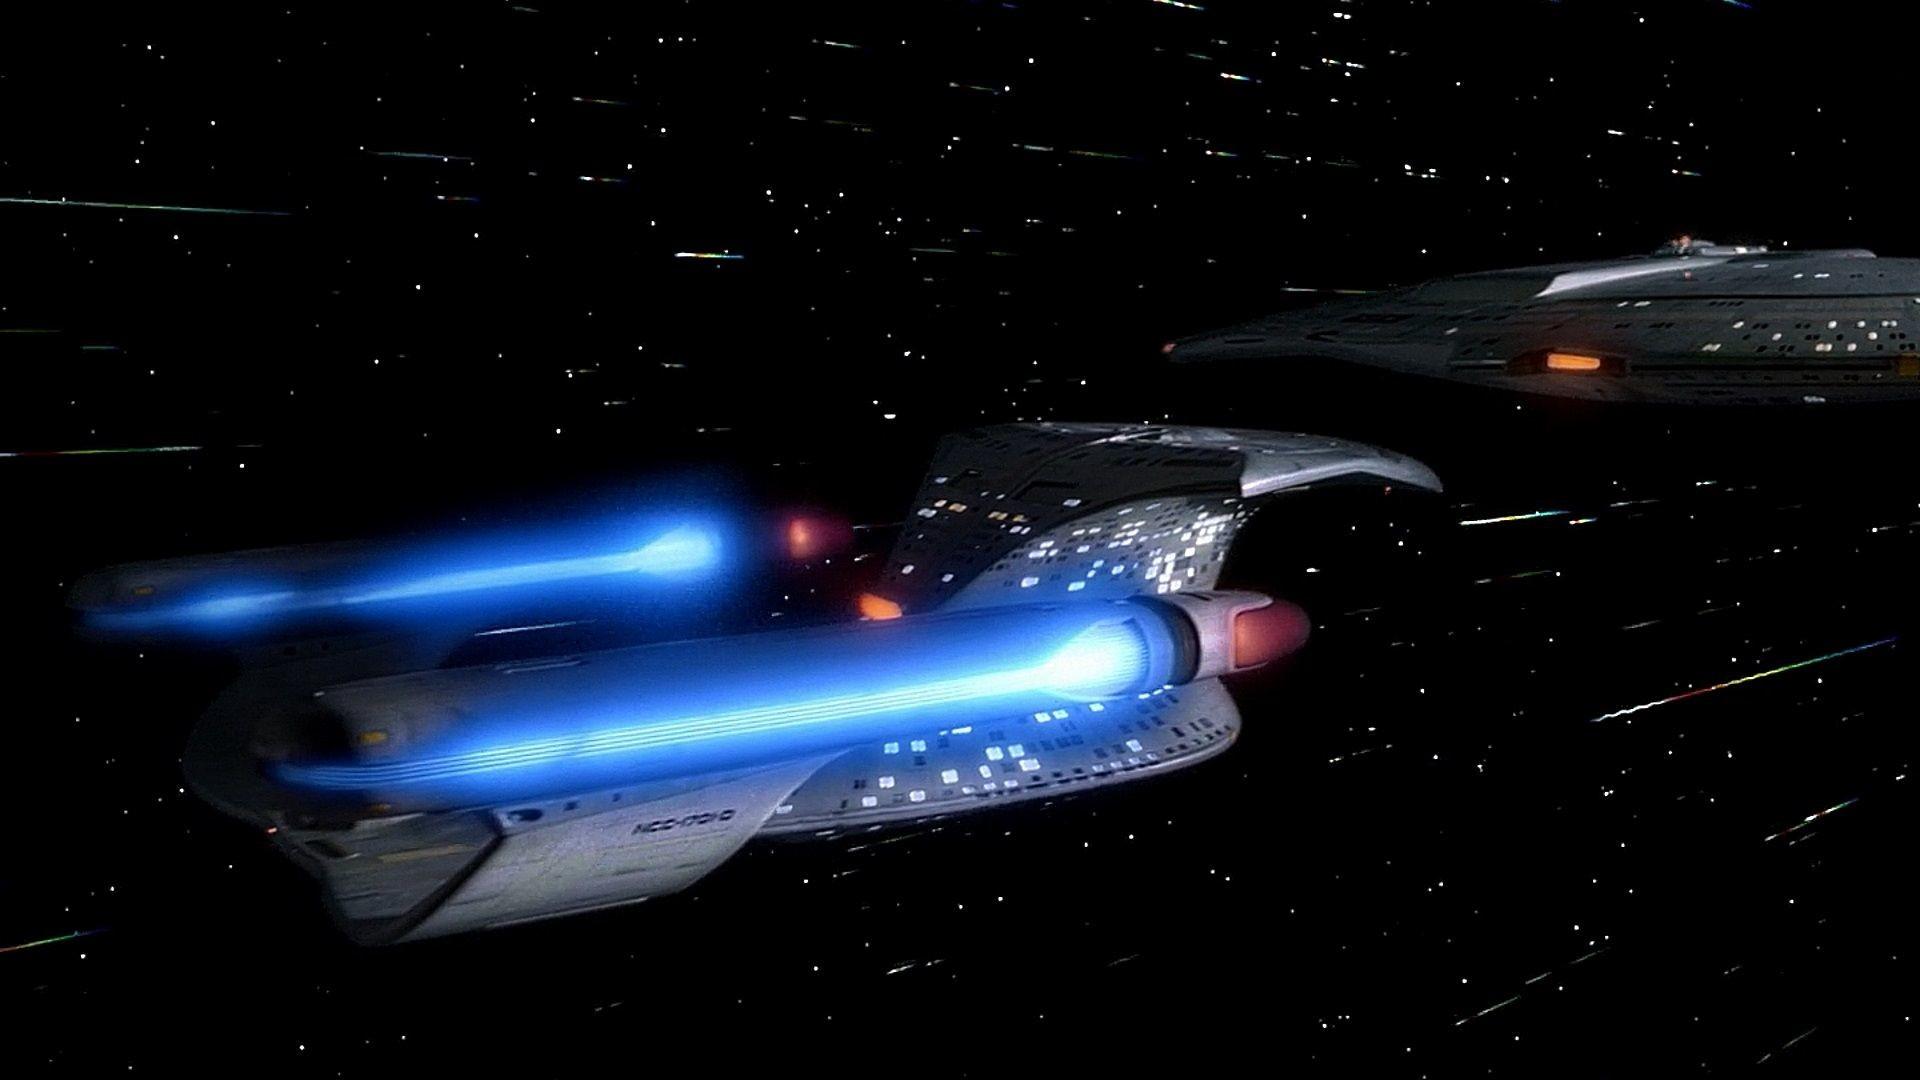 Star Trek: The Next Generation Computer Wallpapers, Desktop .